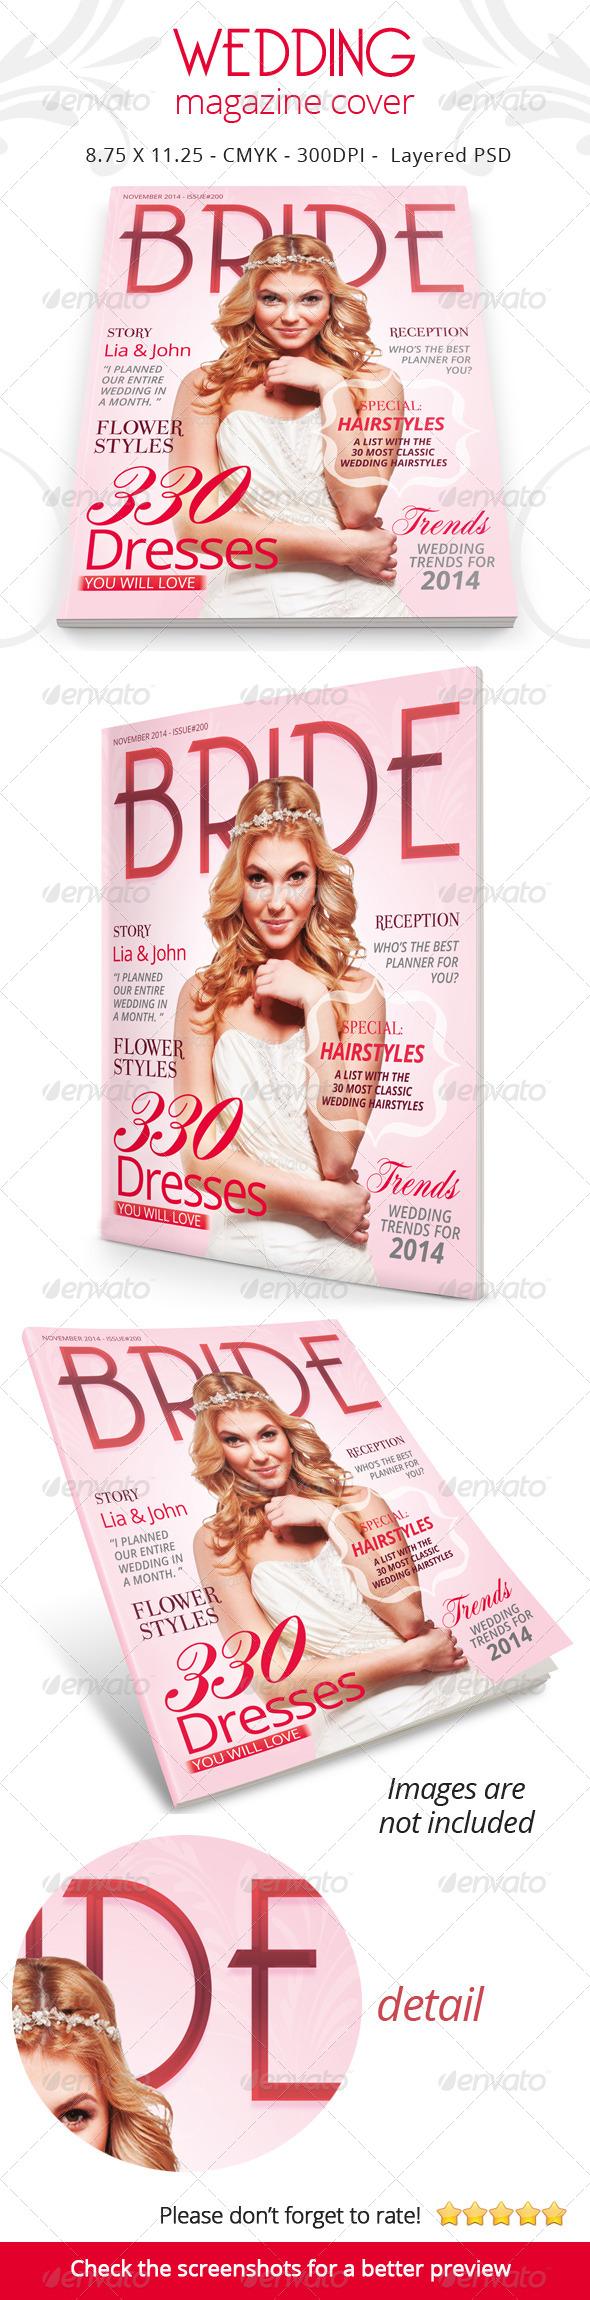 Wedding Magazine Cover - Magazines Print Templates